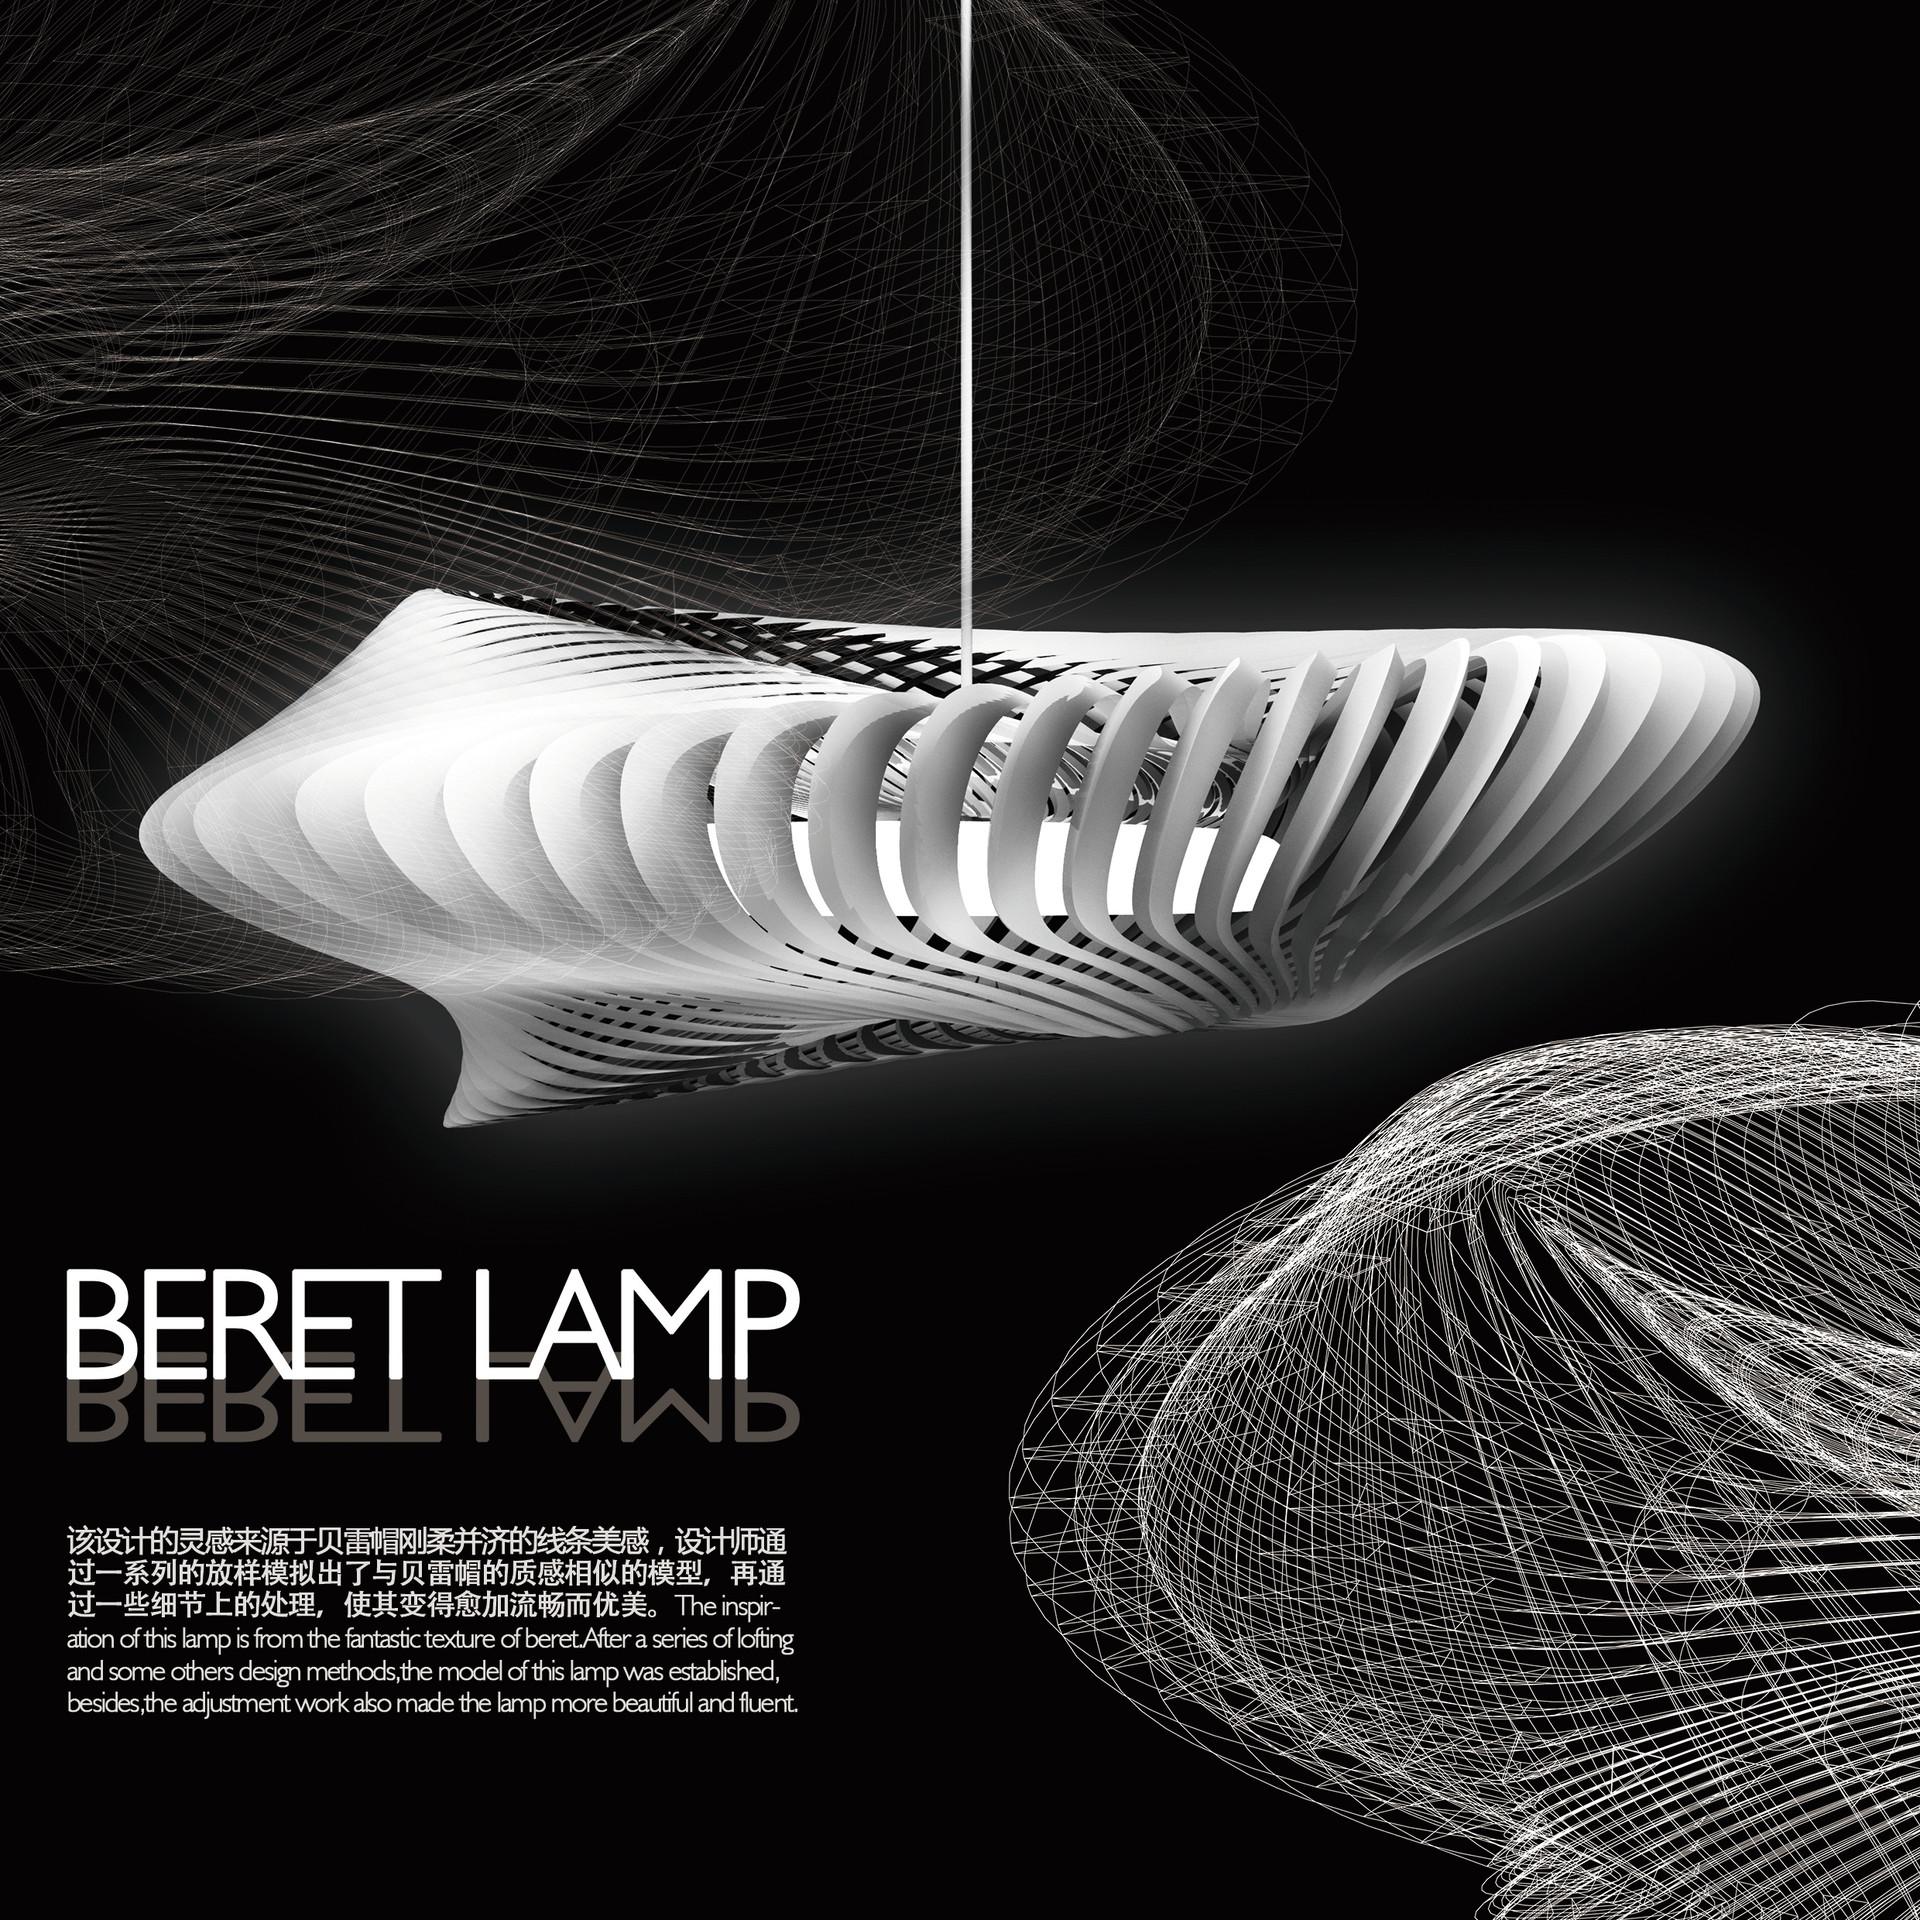 Beret lamp.jpg